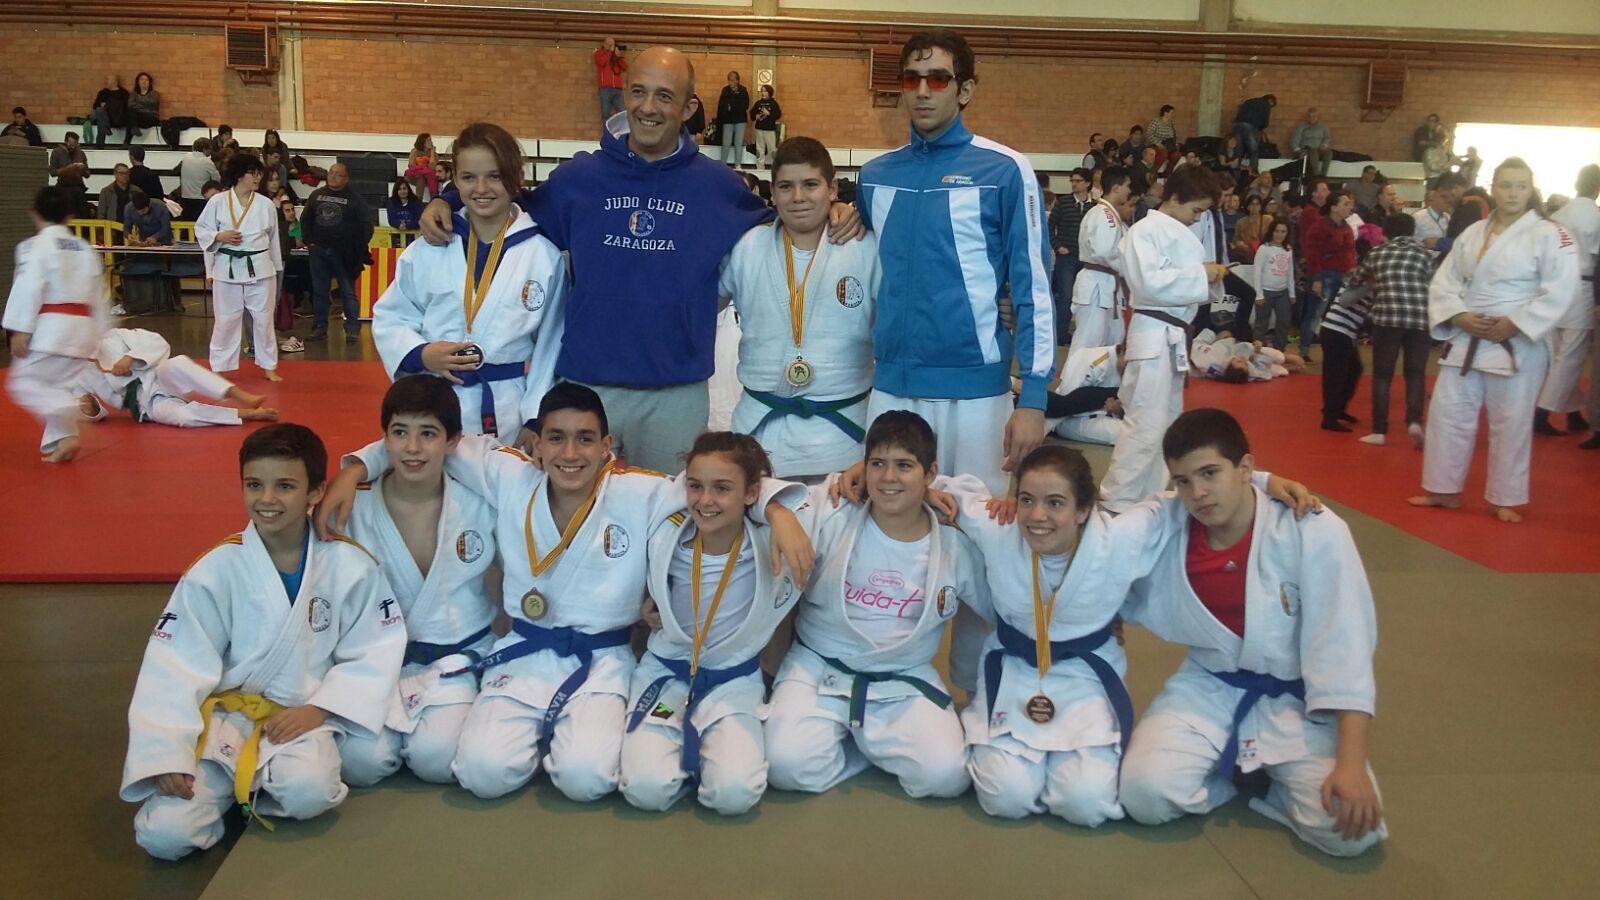 Copa Aragón Infantil-Cadete 29/11/15